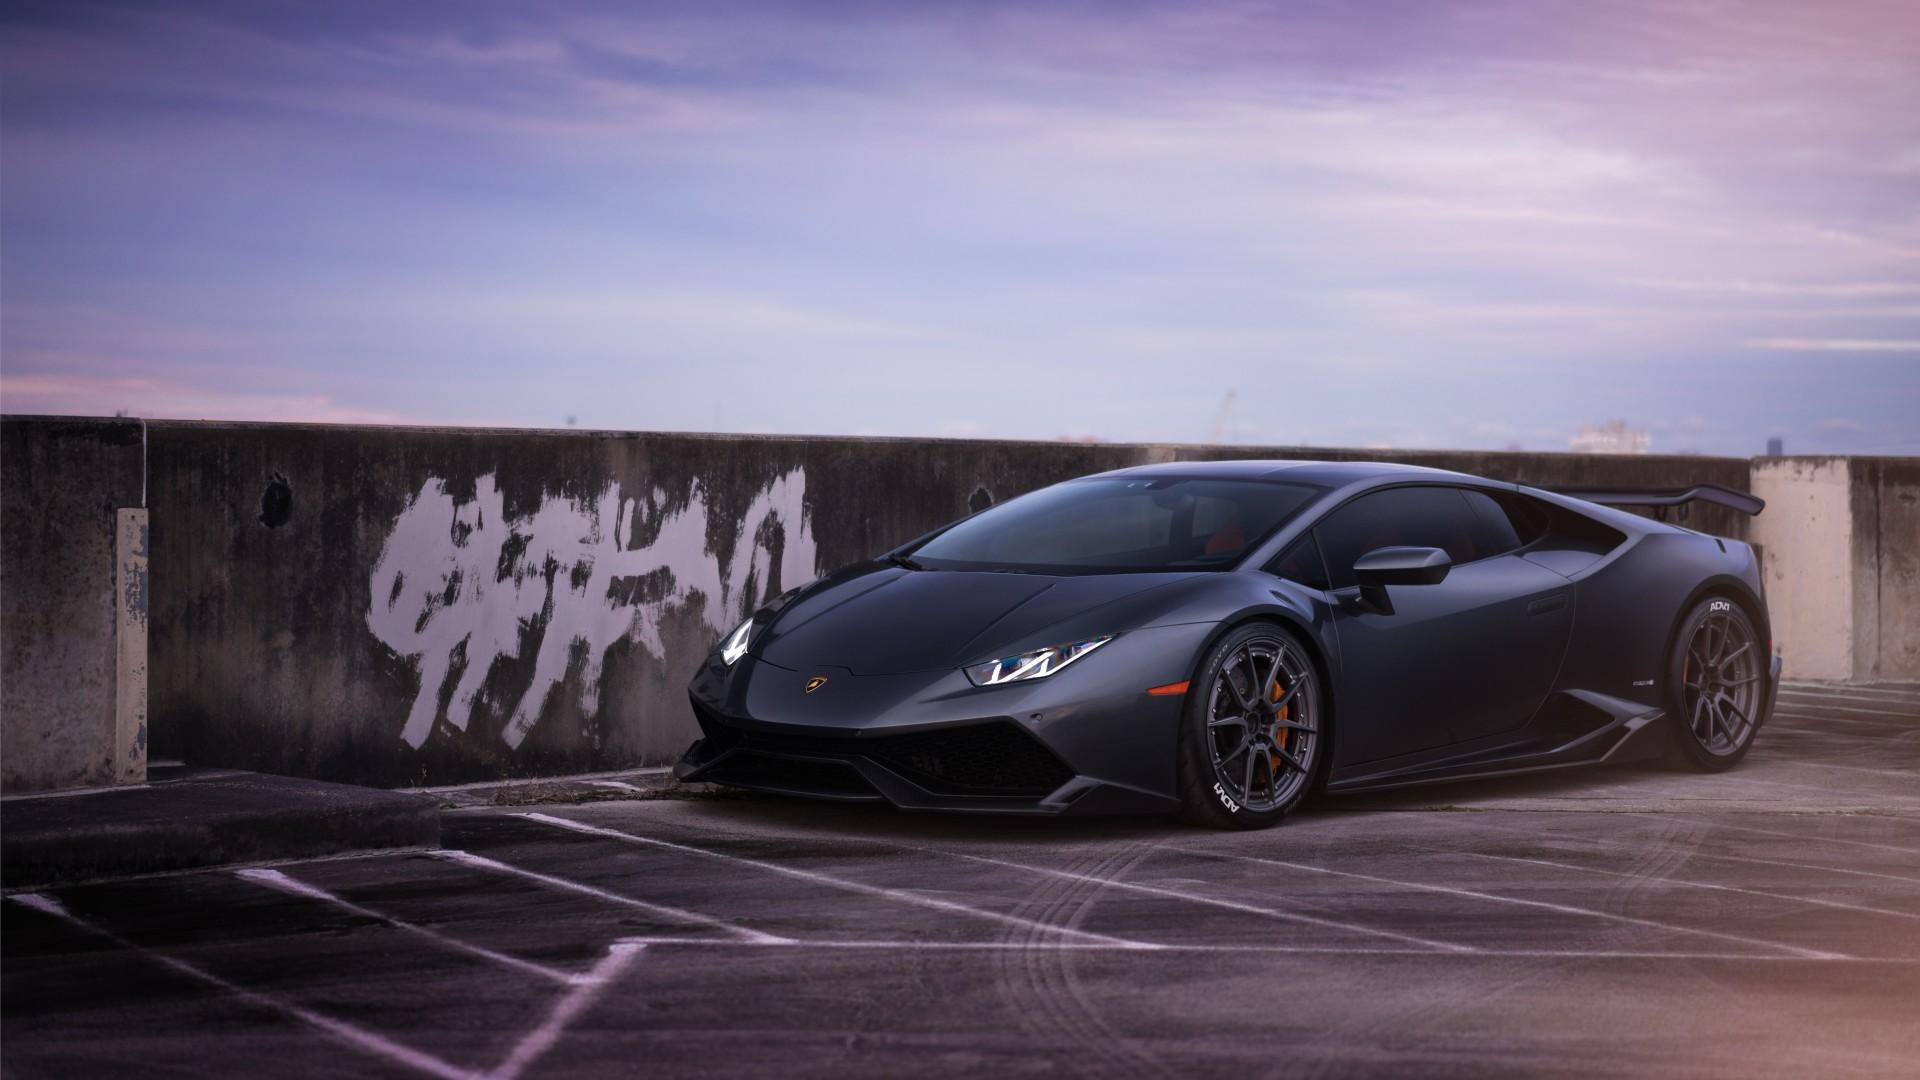 Veneno Hd Wallpaper Lamborghini Huracan On Adv1 Wheels 2 Wallpaper Hd Car